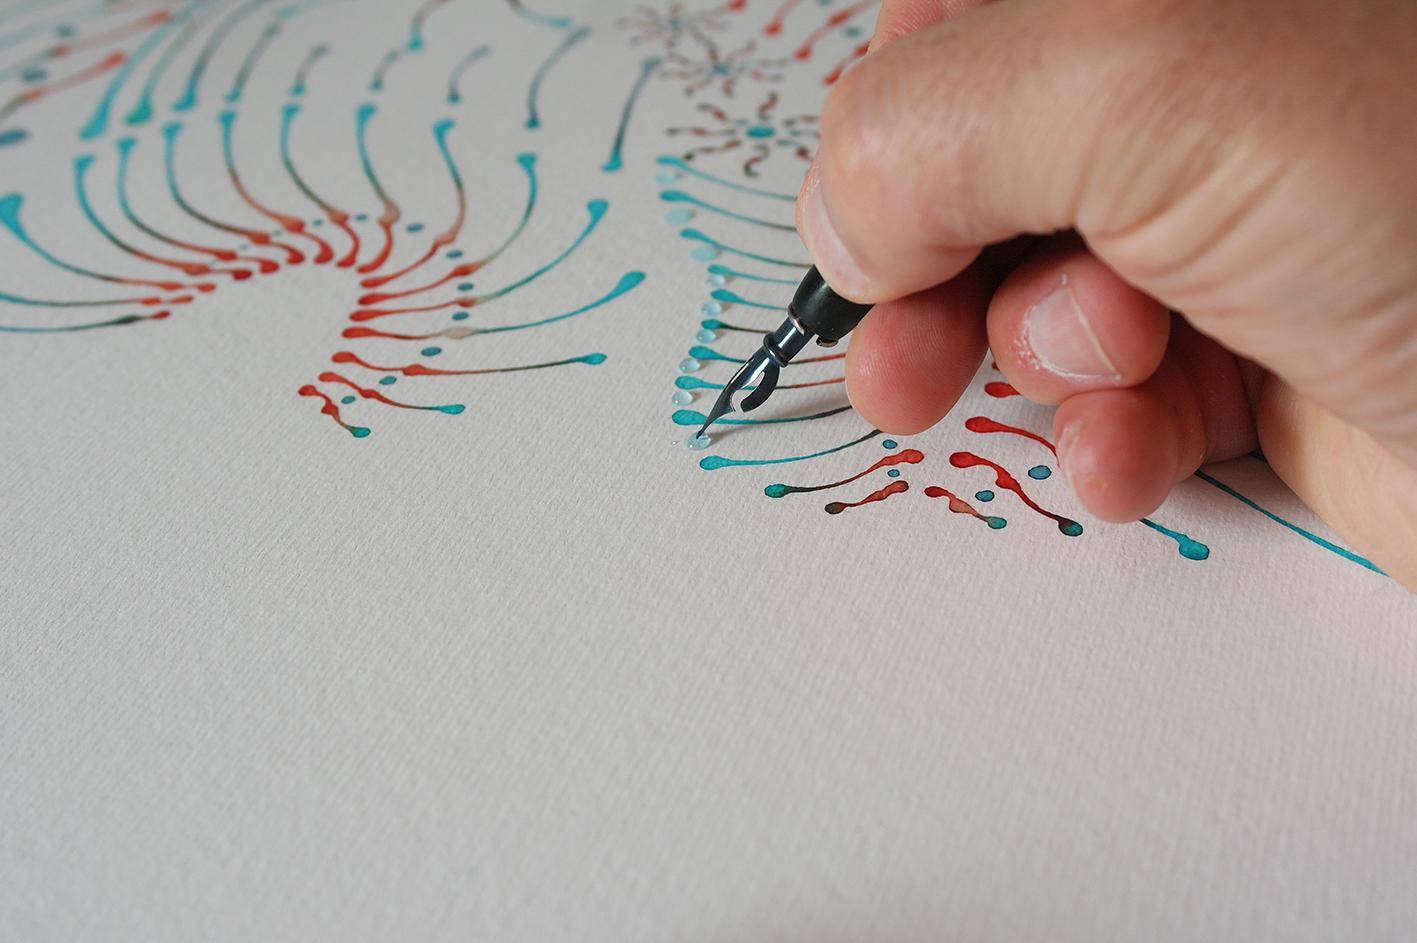 Dotting painting